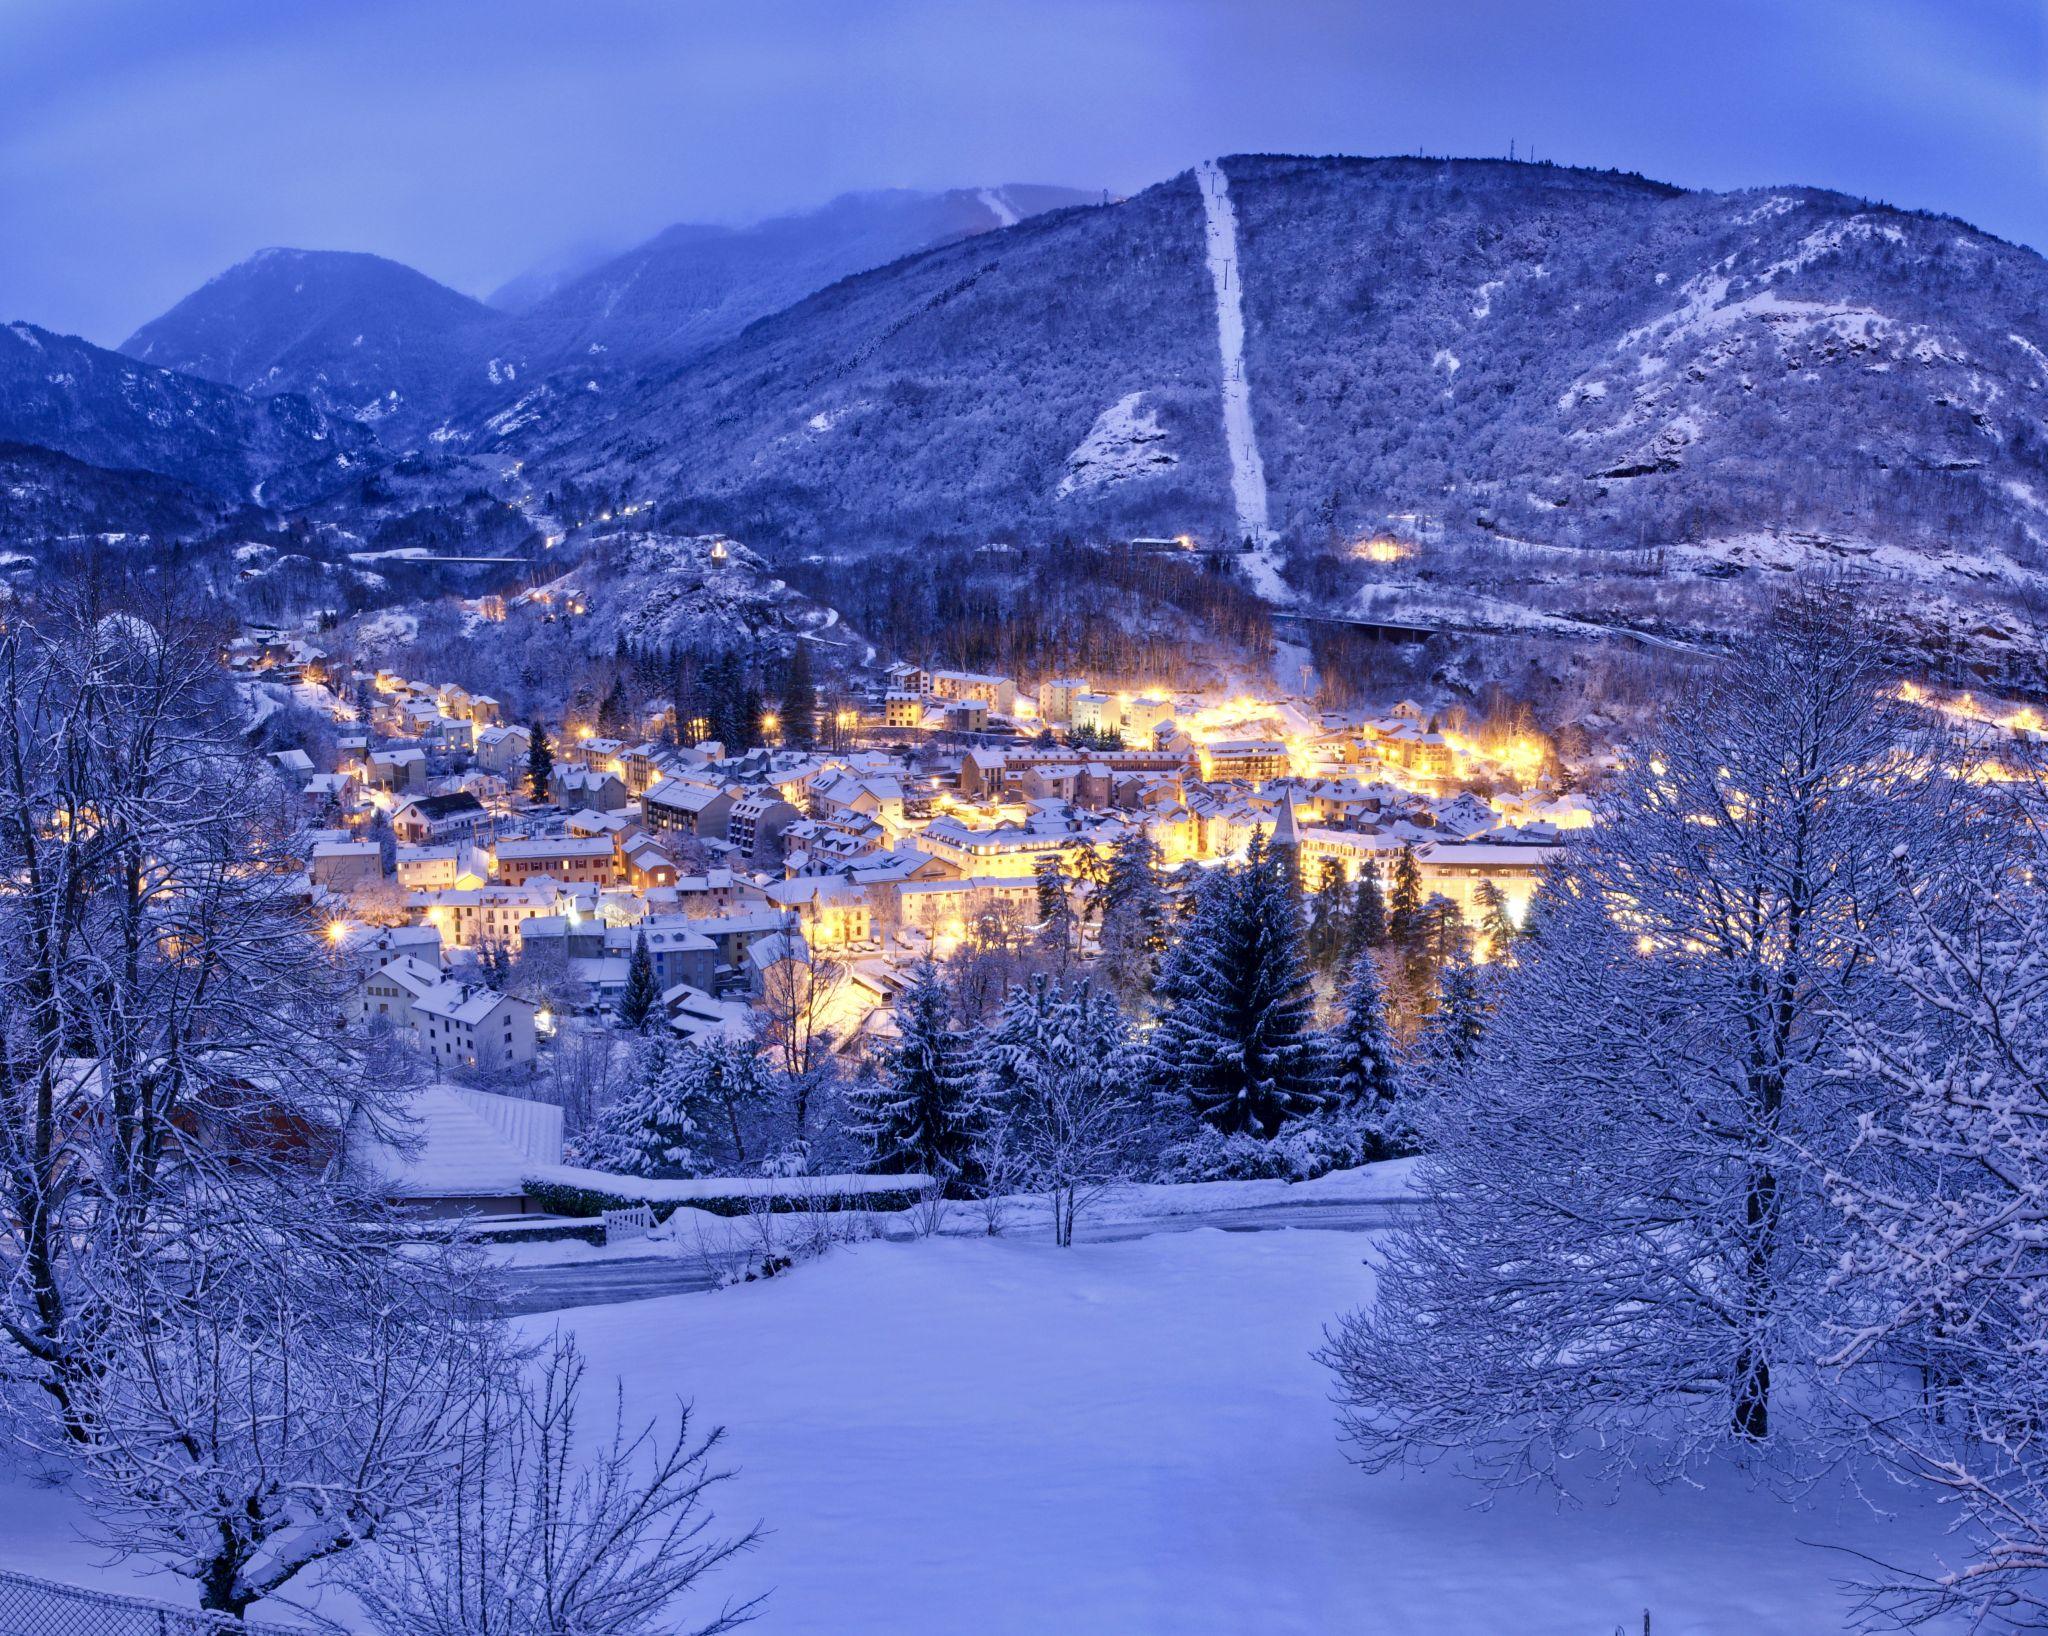 L'Alpage, France